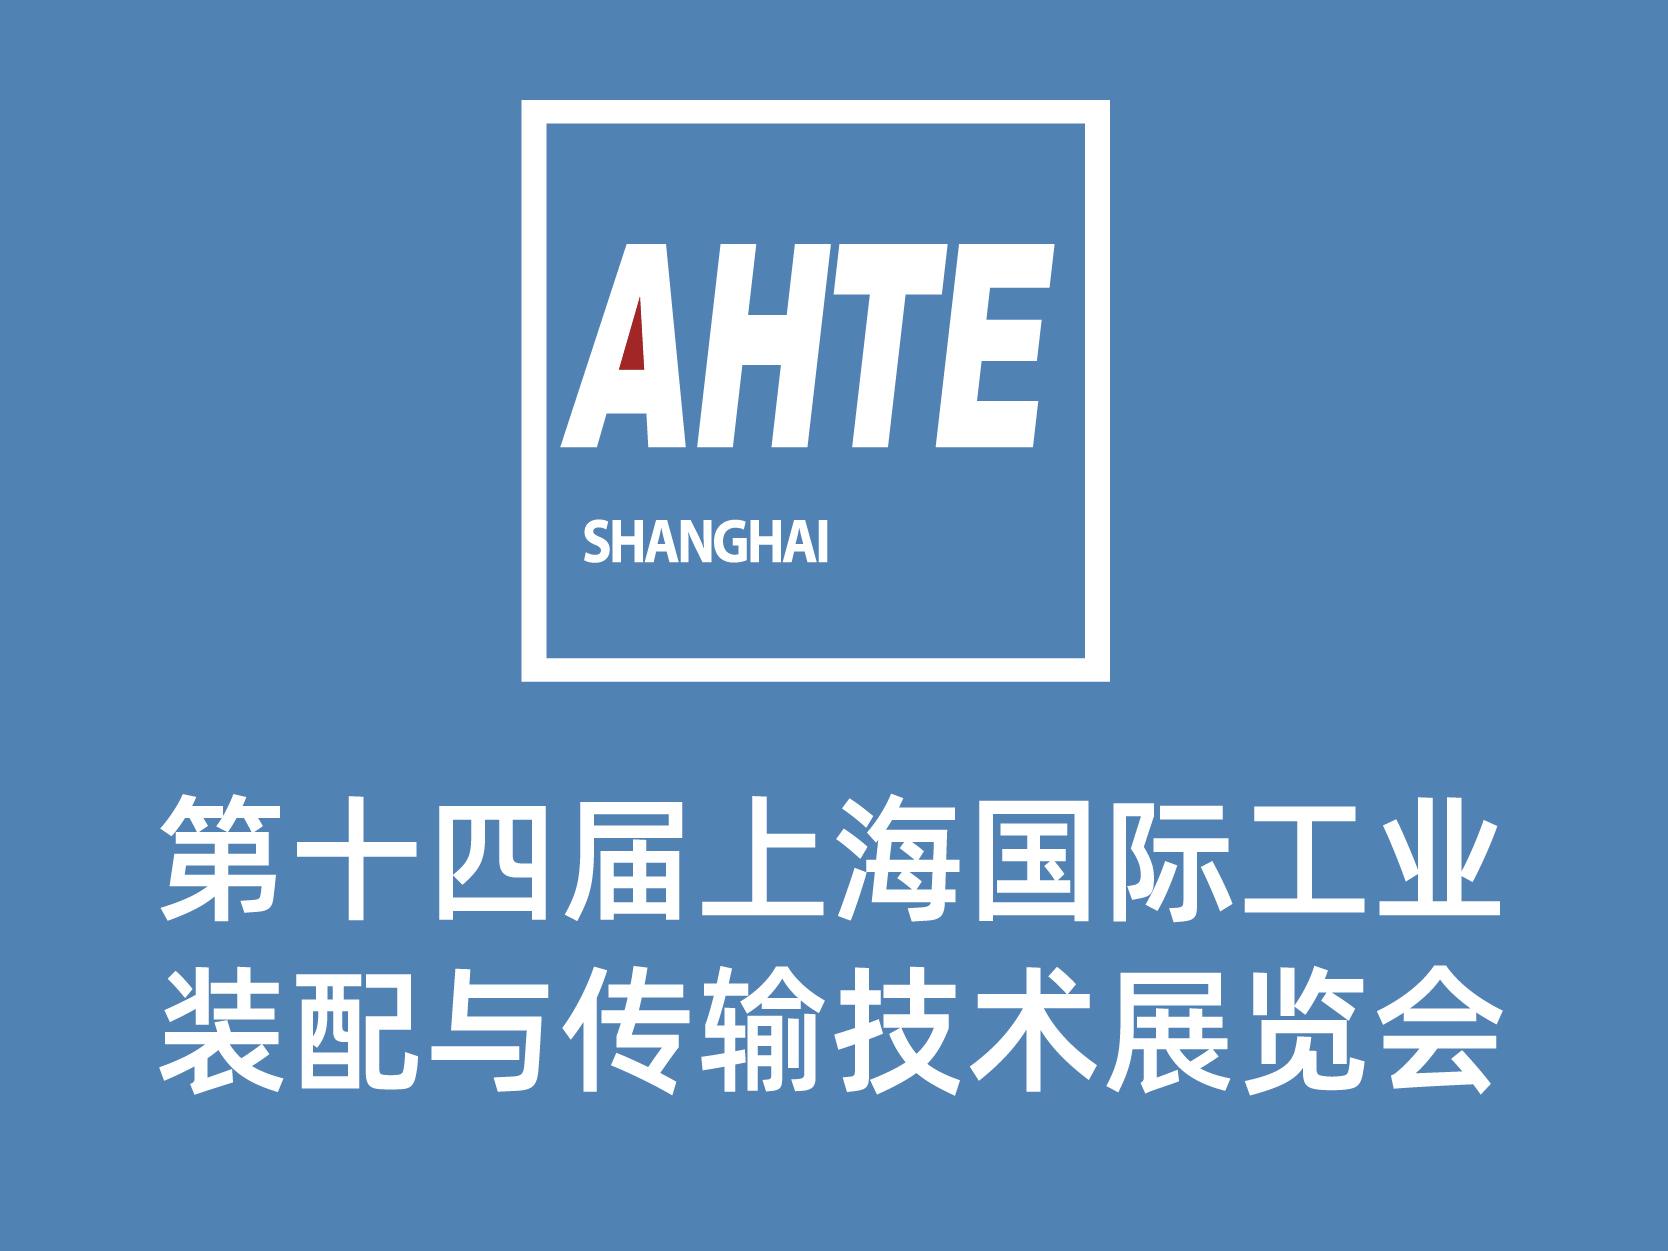 AHTE 2021 �W�十四届上�v国际工业装配与传输技术展览会